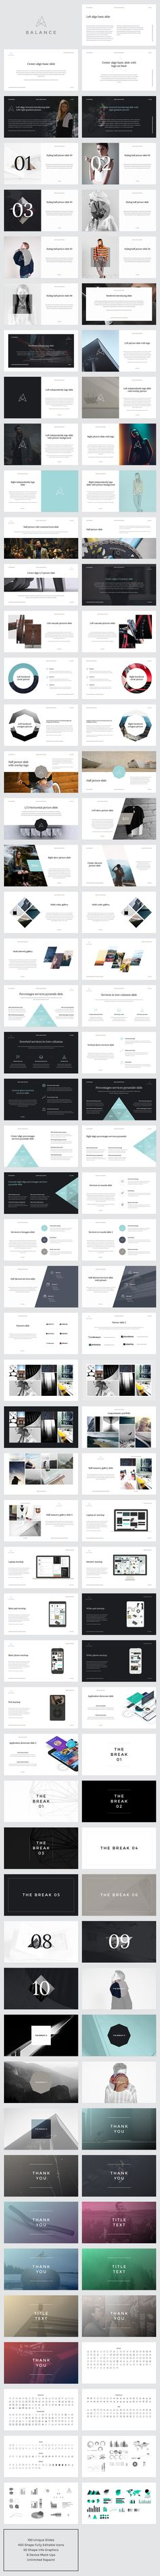 BALANCE | Keynote Presentation by GoaShape on Creative Market